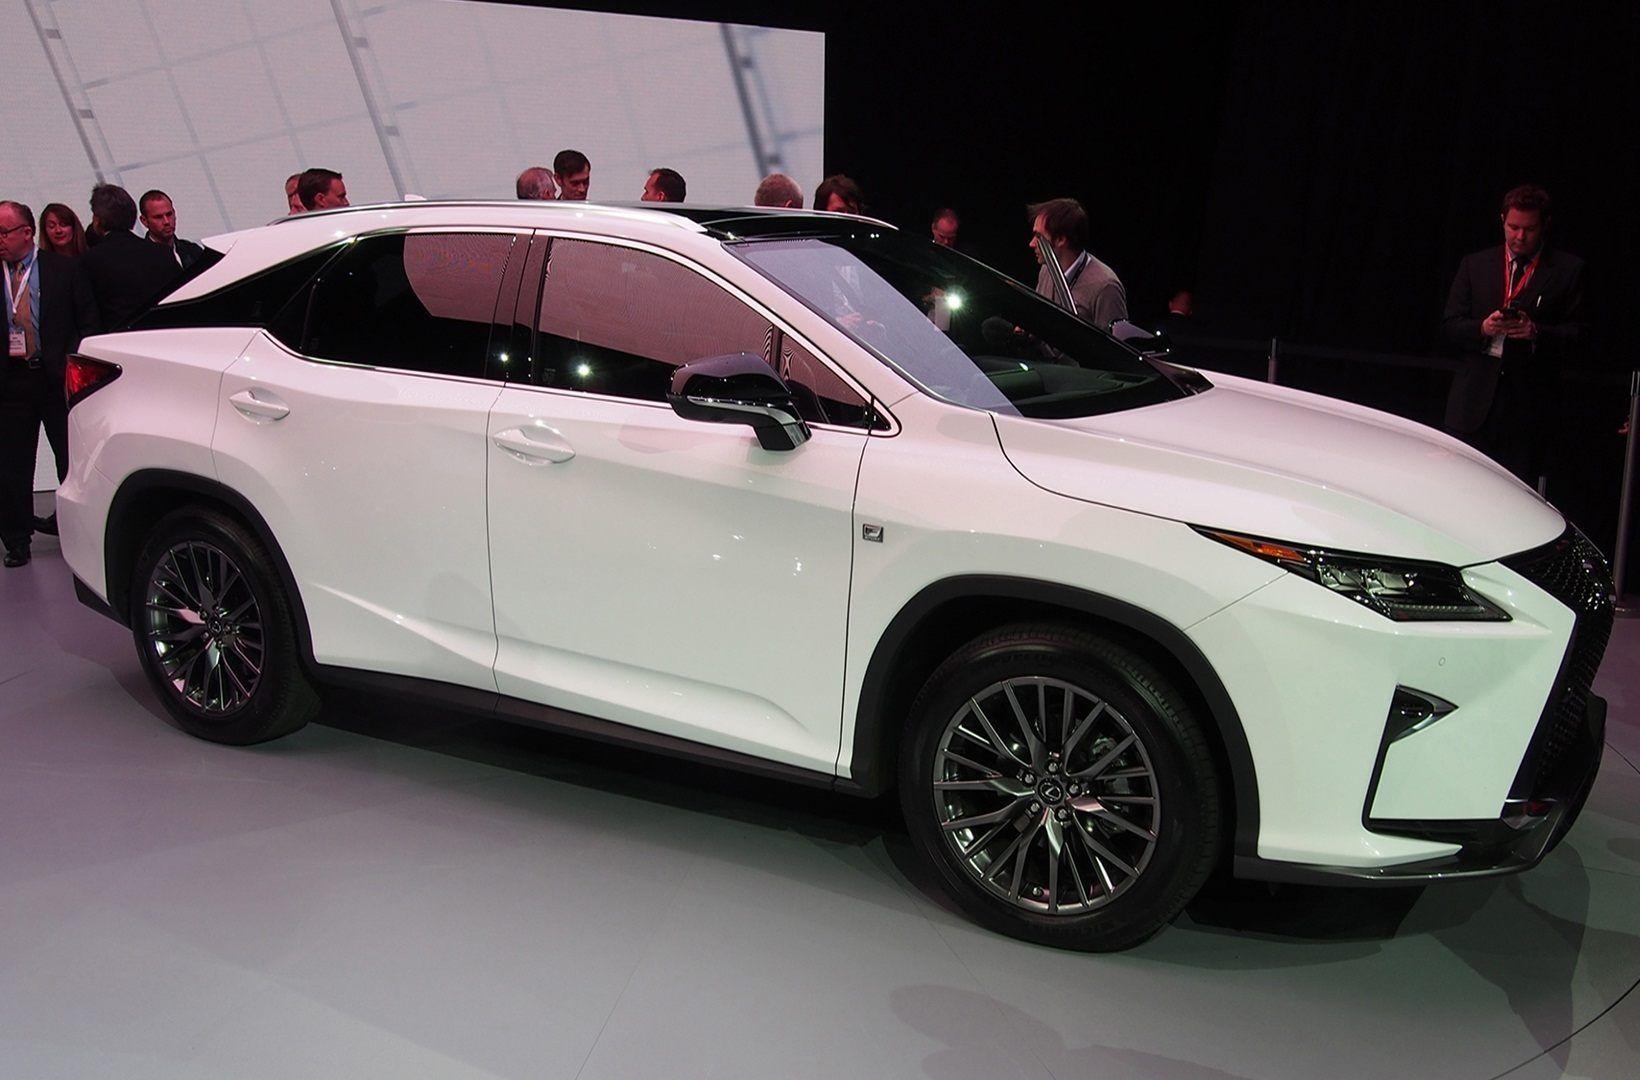 2020 Lexus Rx 350 Redesign And Price Lexus Rx 350 Lexus Gx Lexus Gx 460